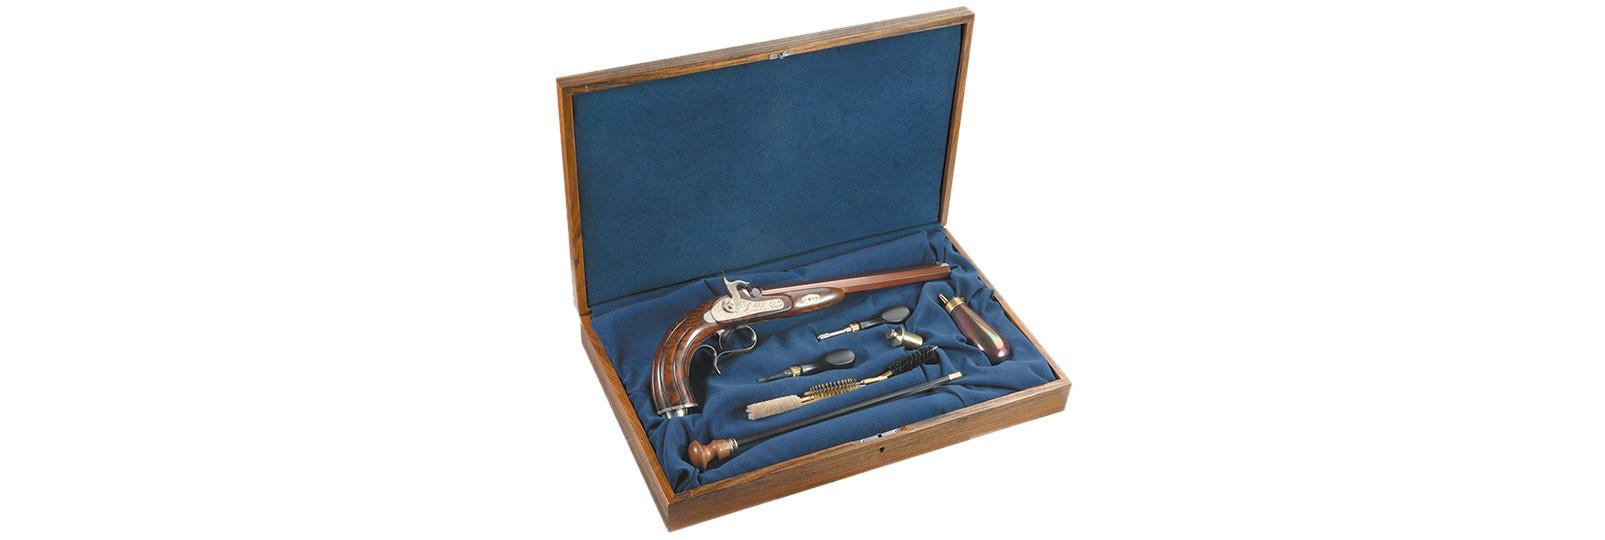 Pistola Kuchenreuter DELUXE in cofanetto